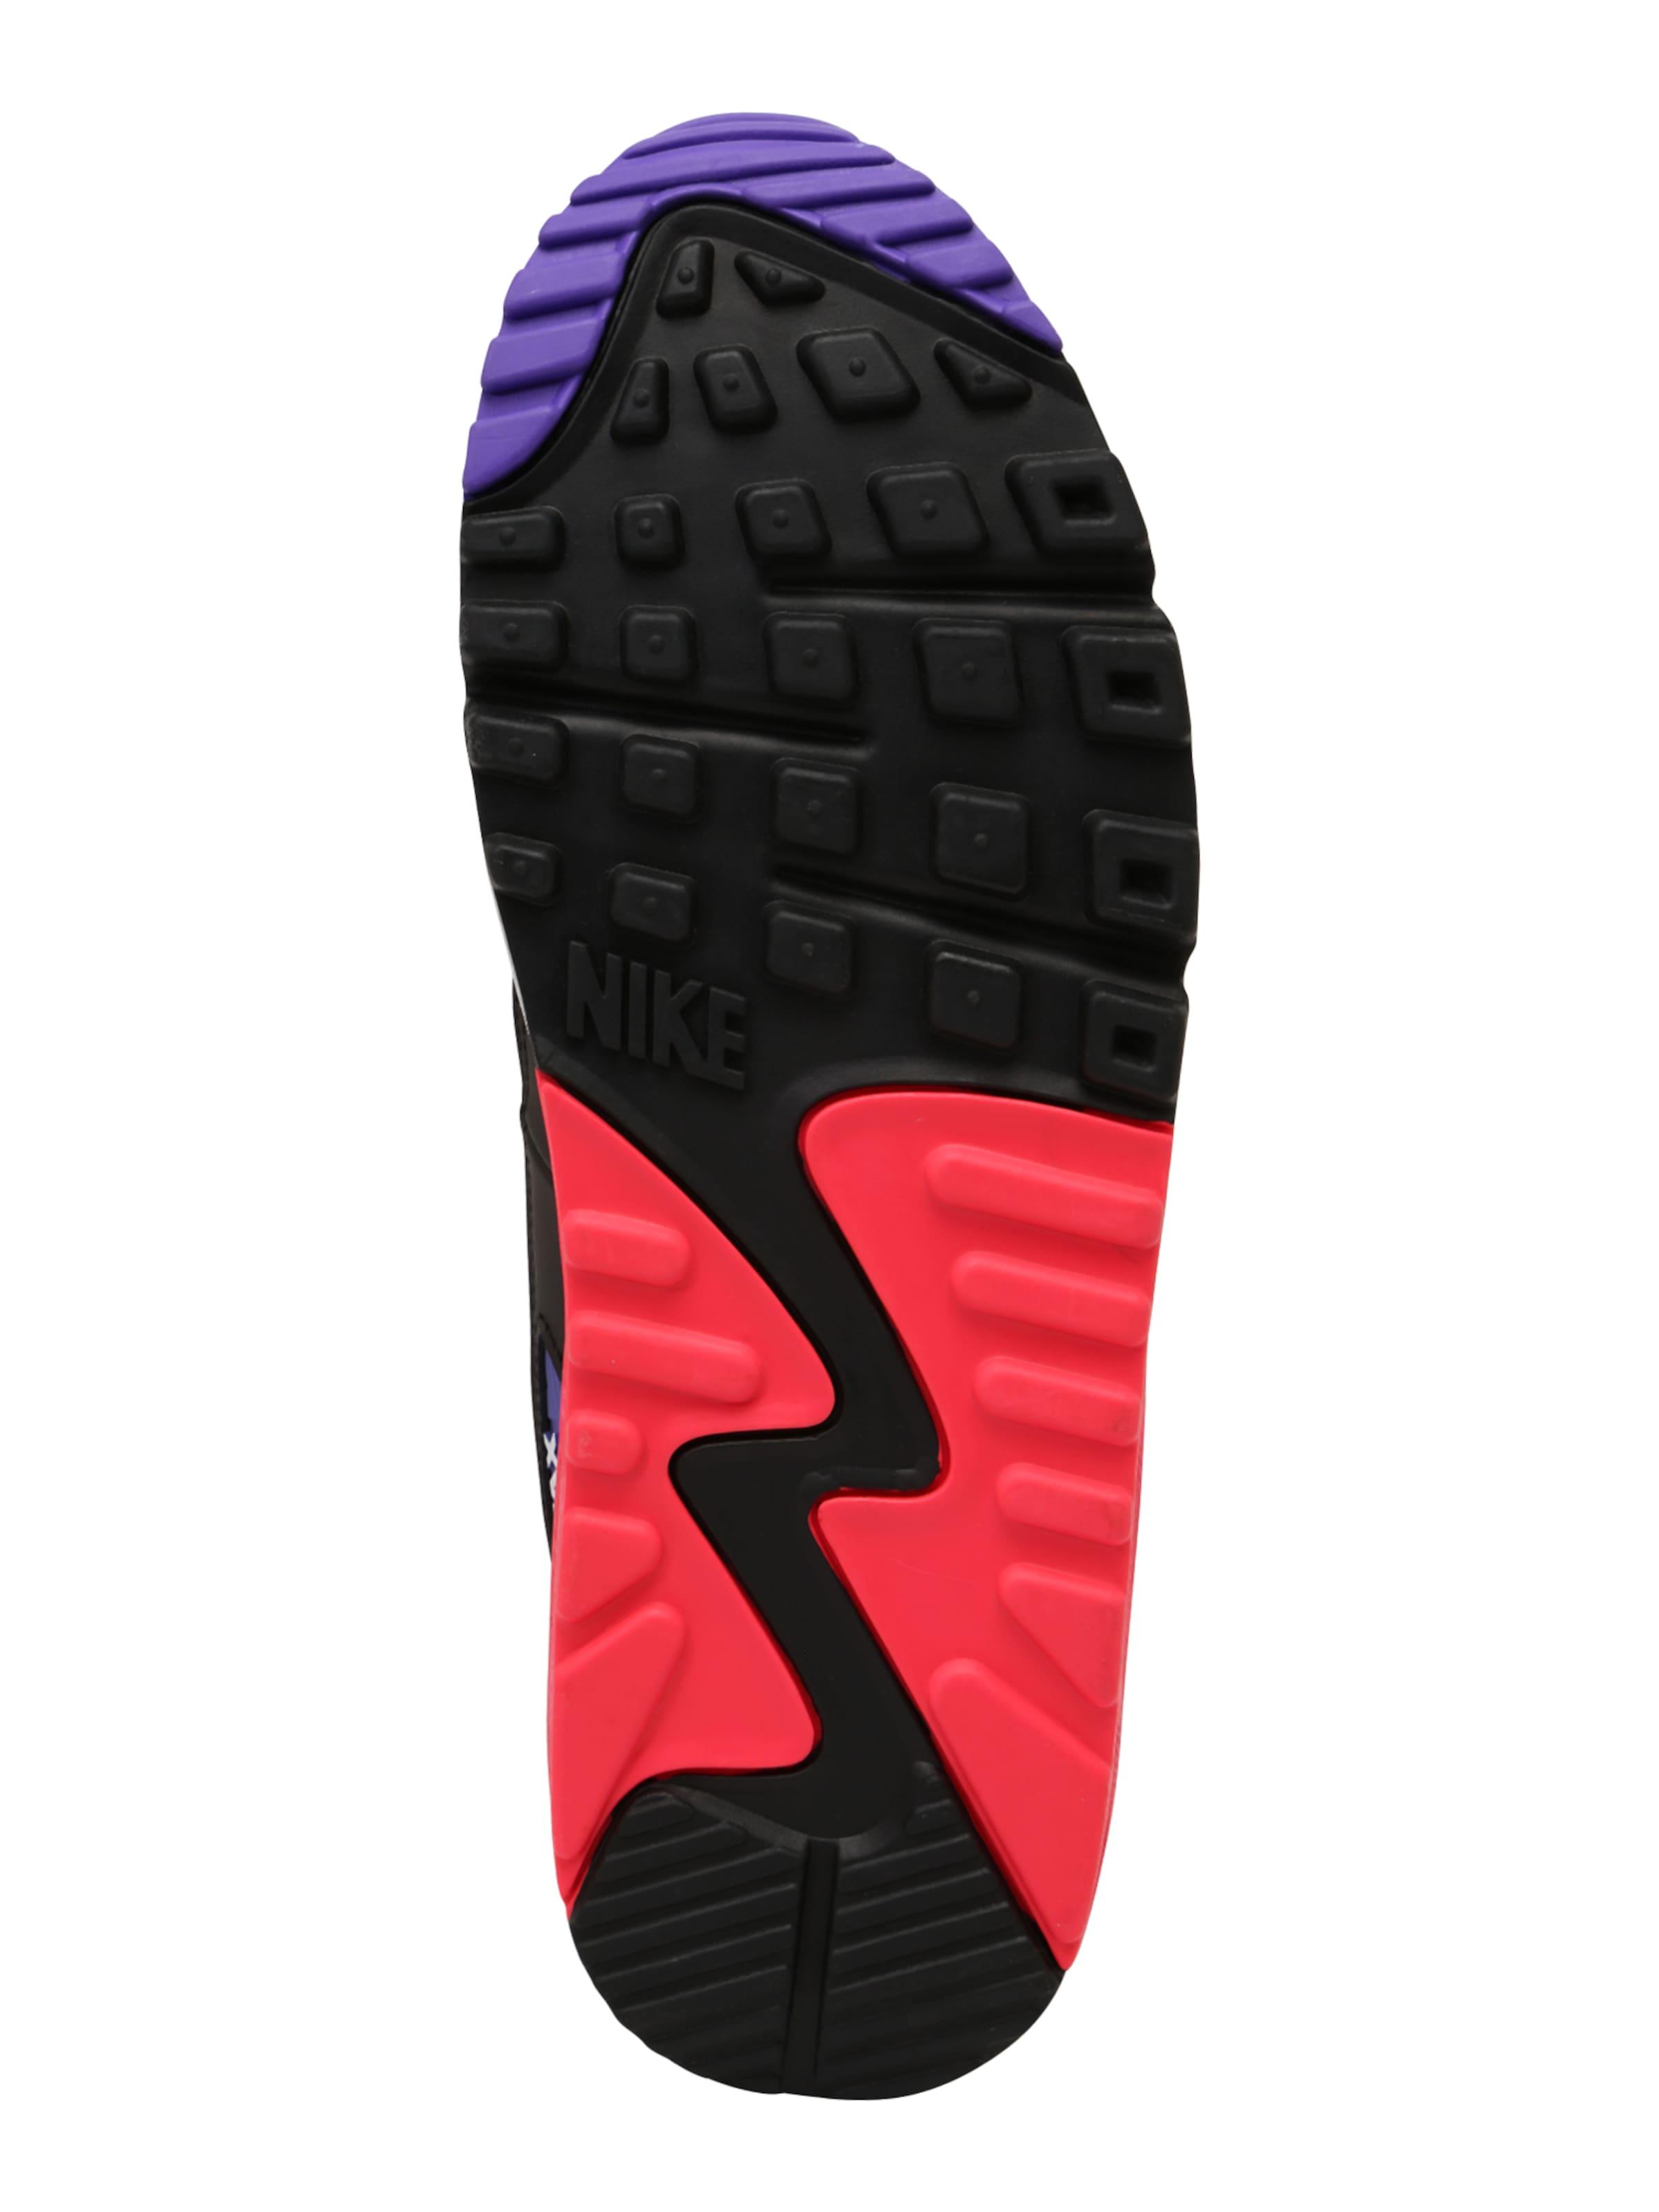 Weiß Max Low In Sportswear Nike '90 Essential' RotSchwarz Sneaker 'air QdEBrCoexW